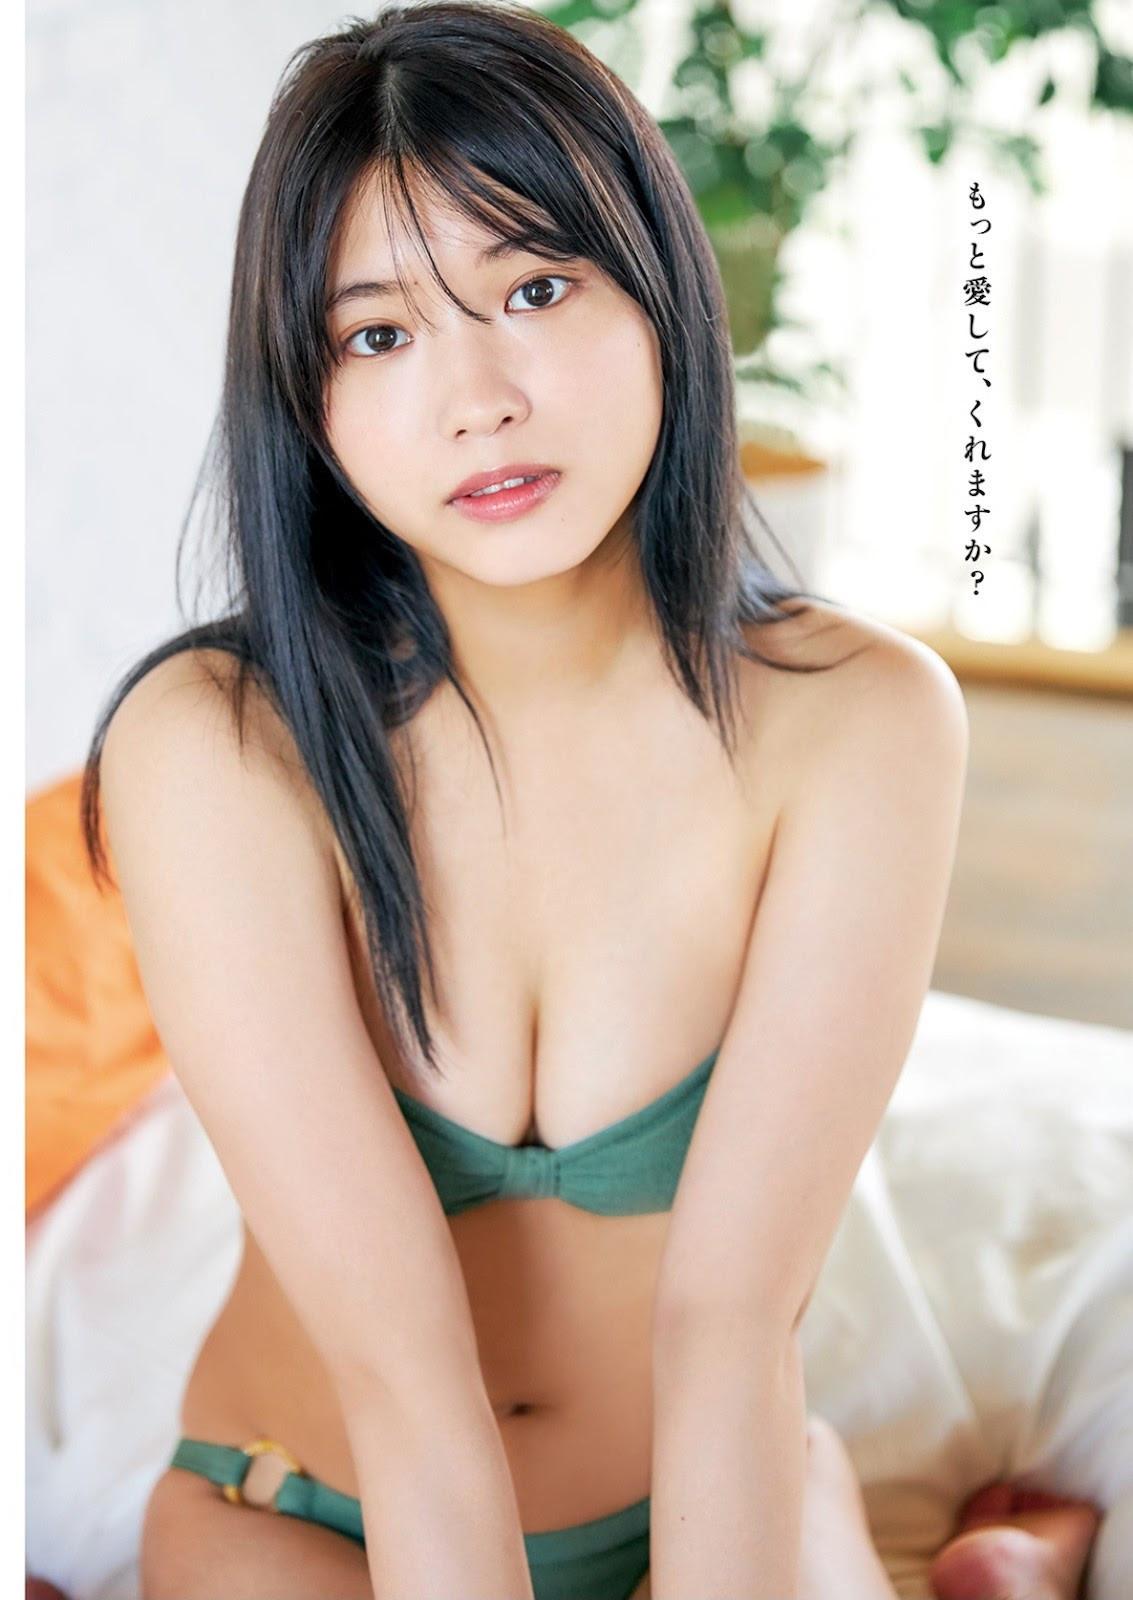 Airi Furuta 古田愛理 Jun Amaki 天木じゅん 1-004